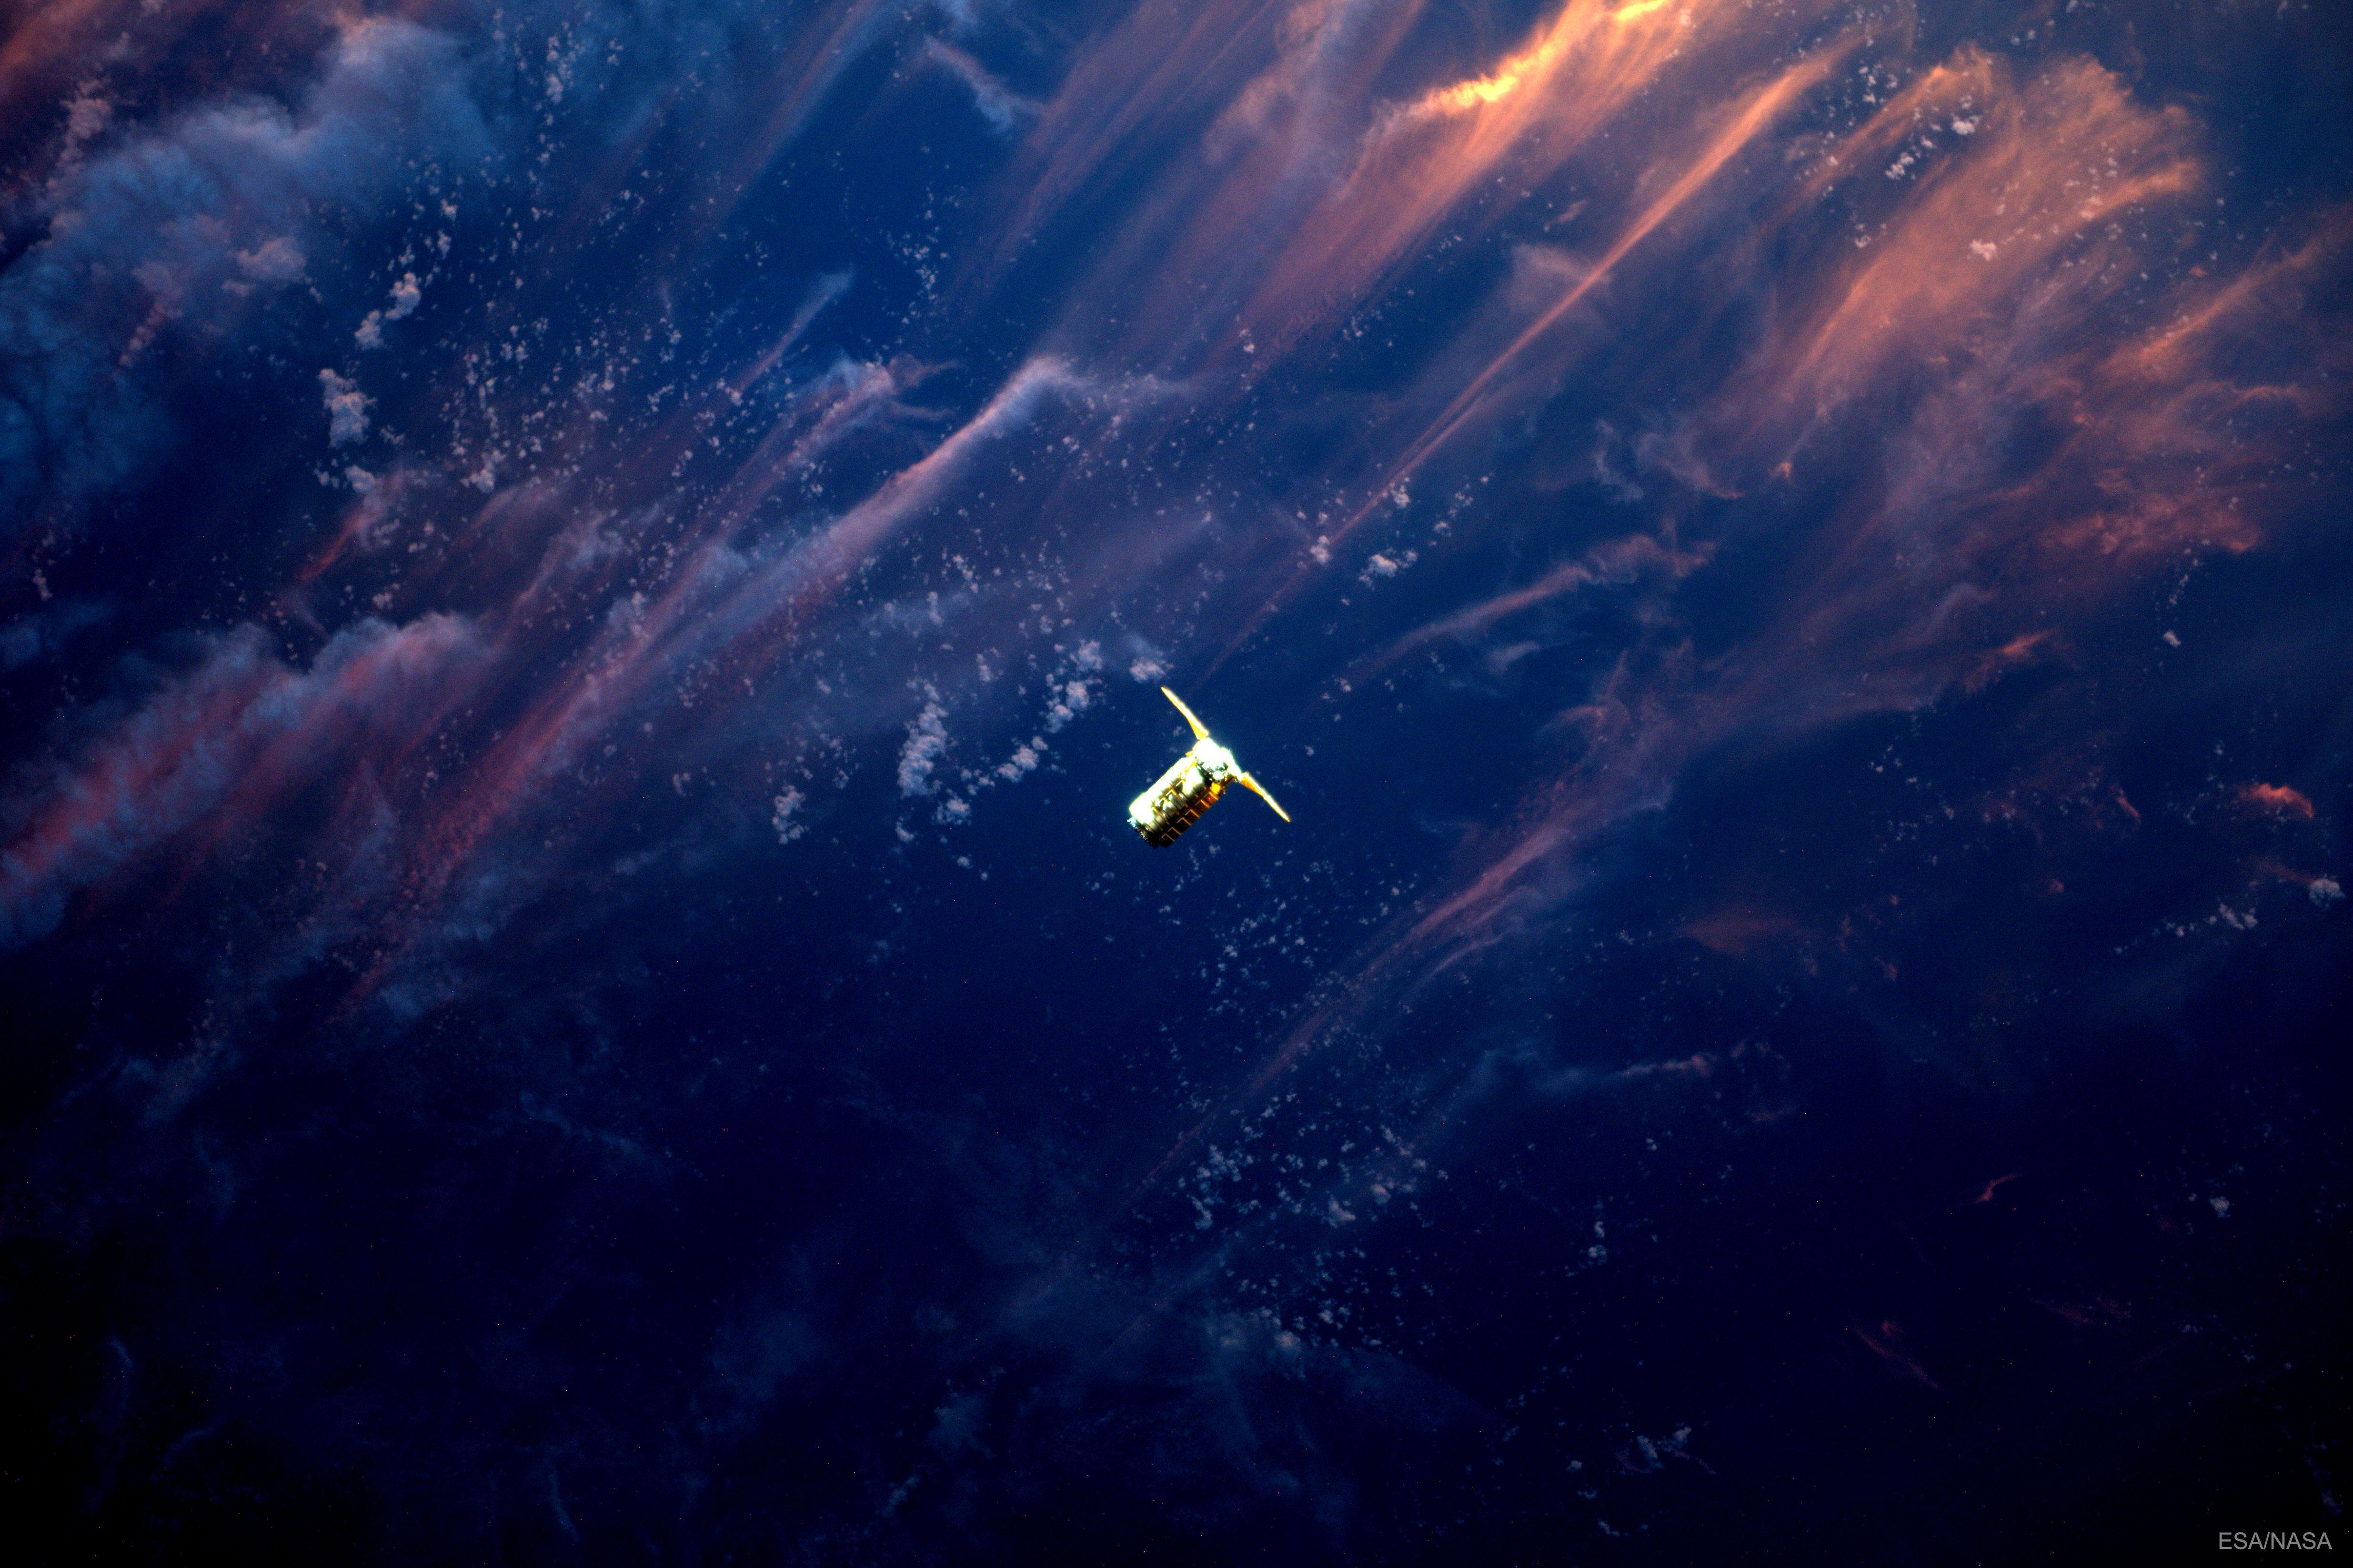 CygnusApproach_ISS_4940.jpg